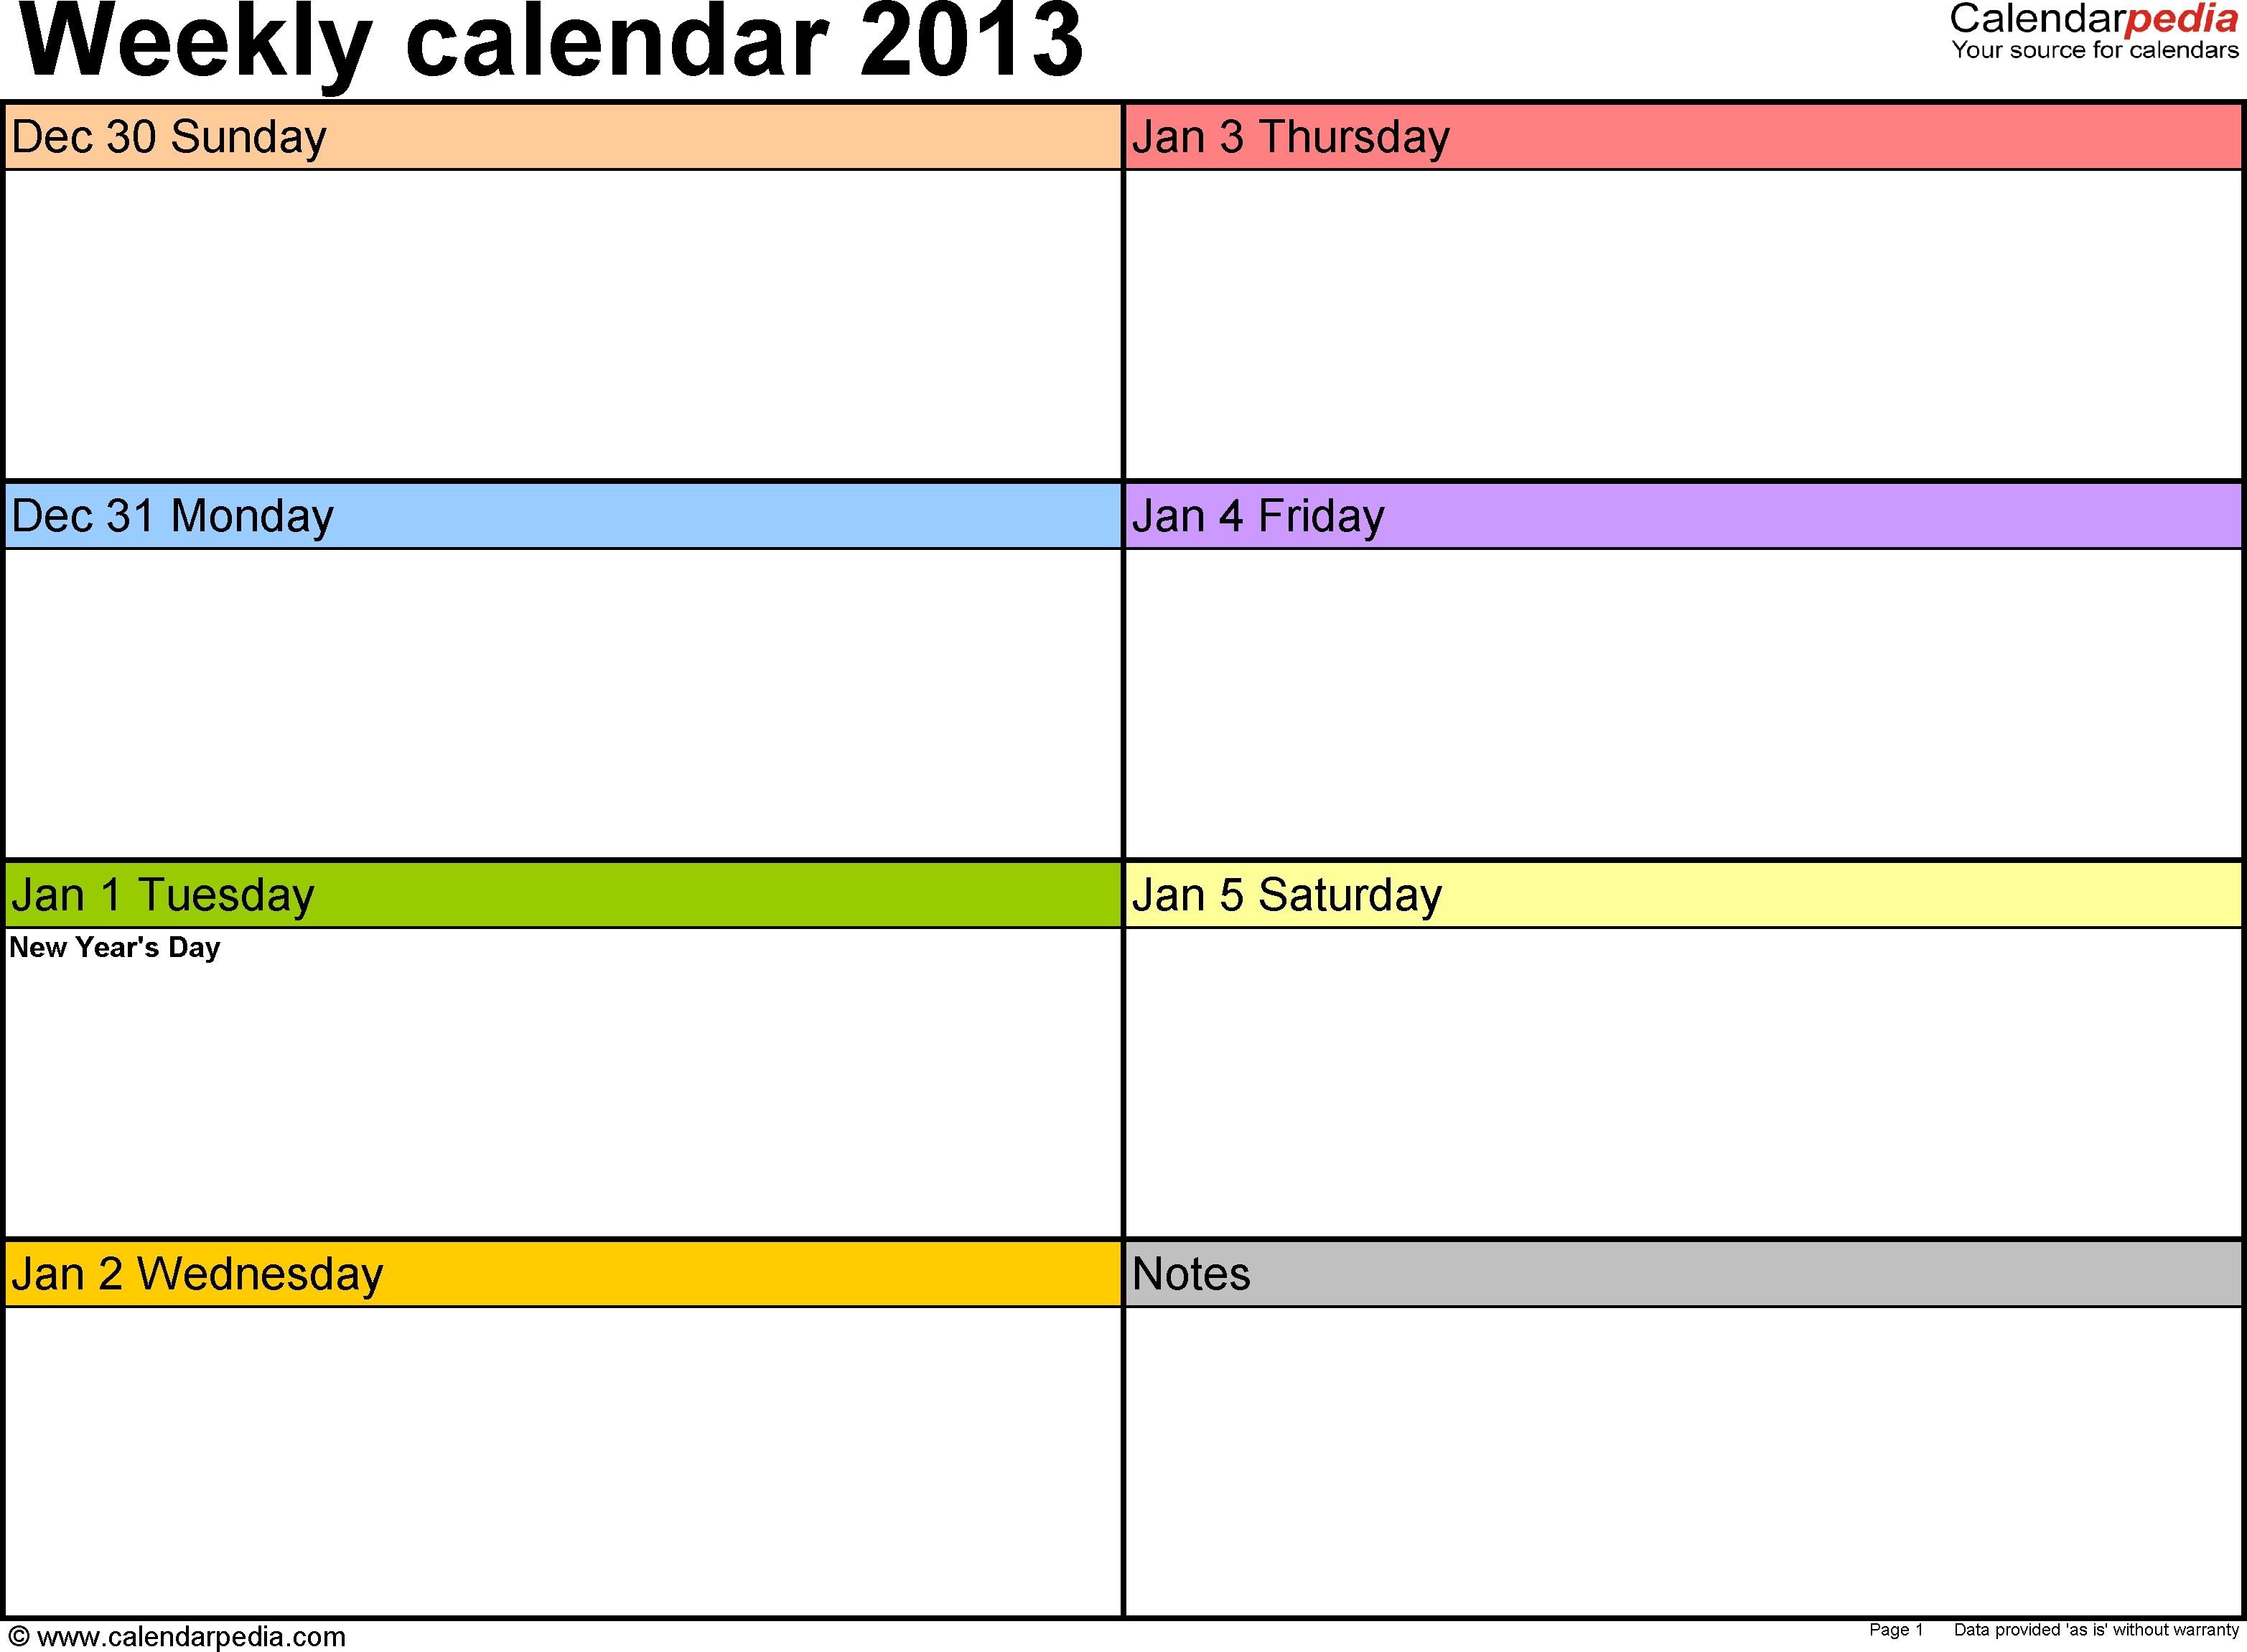 Weekly Calendar 2013 For Word - 4 Free Printable Templates for Free Printable Weekly Planner Templates